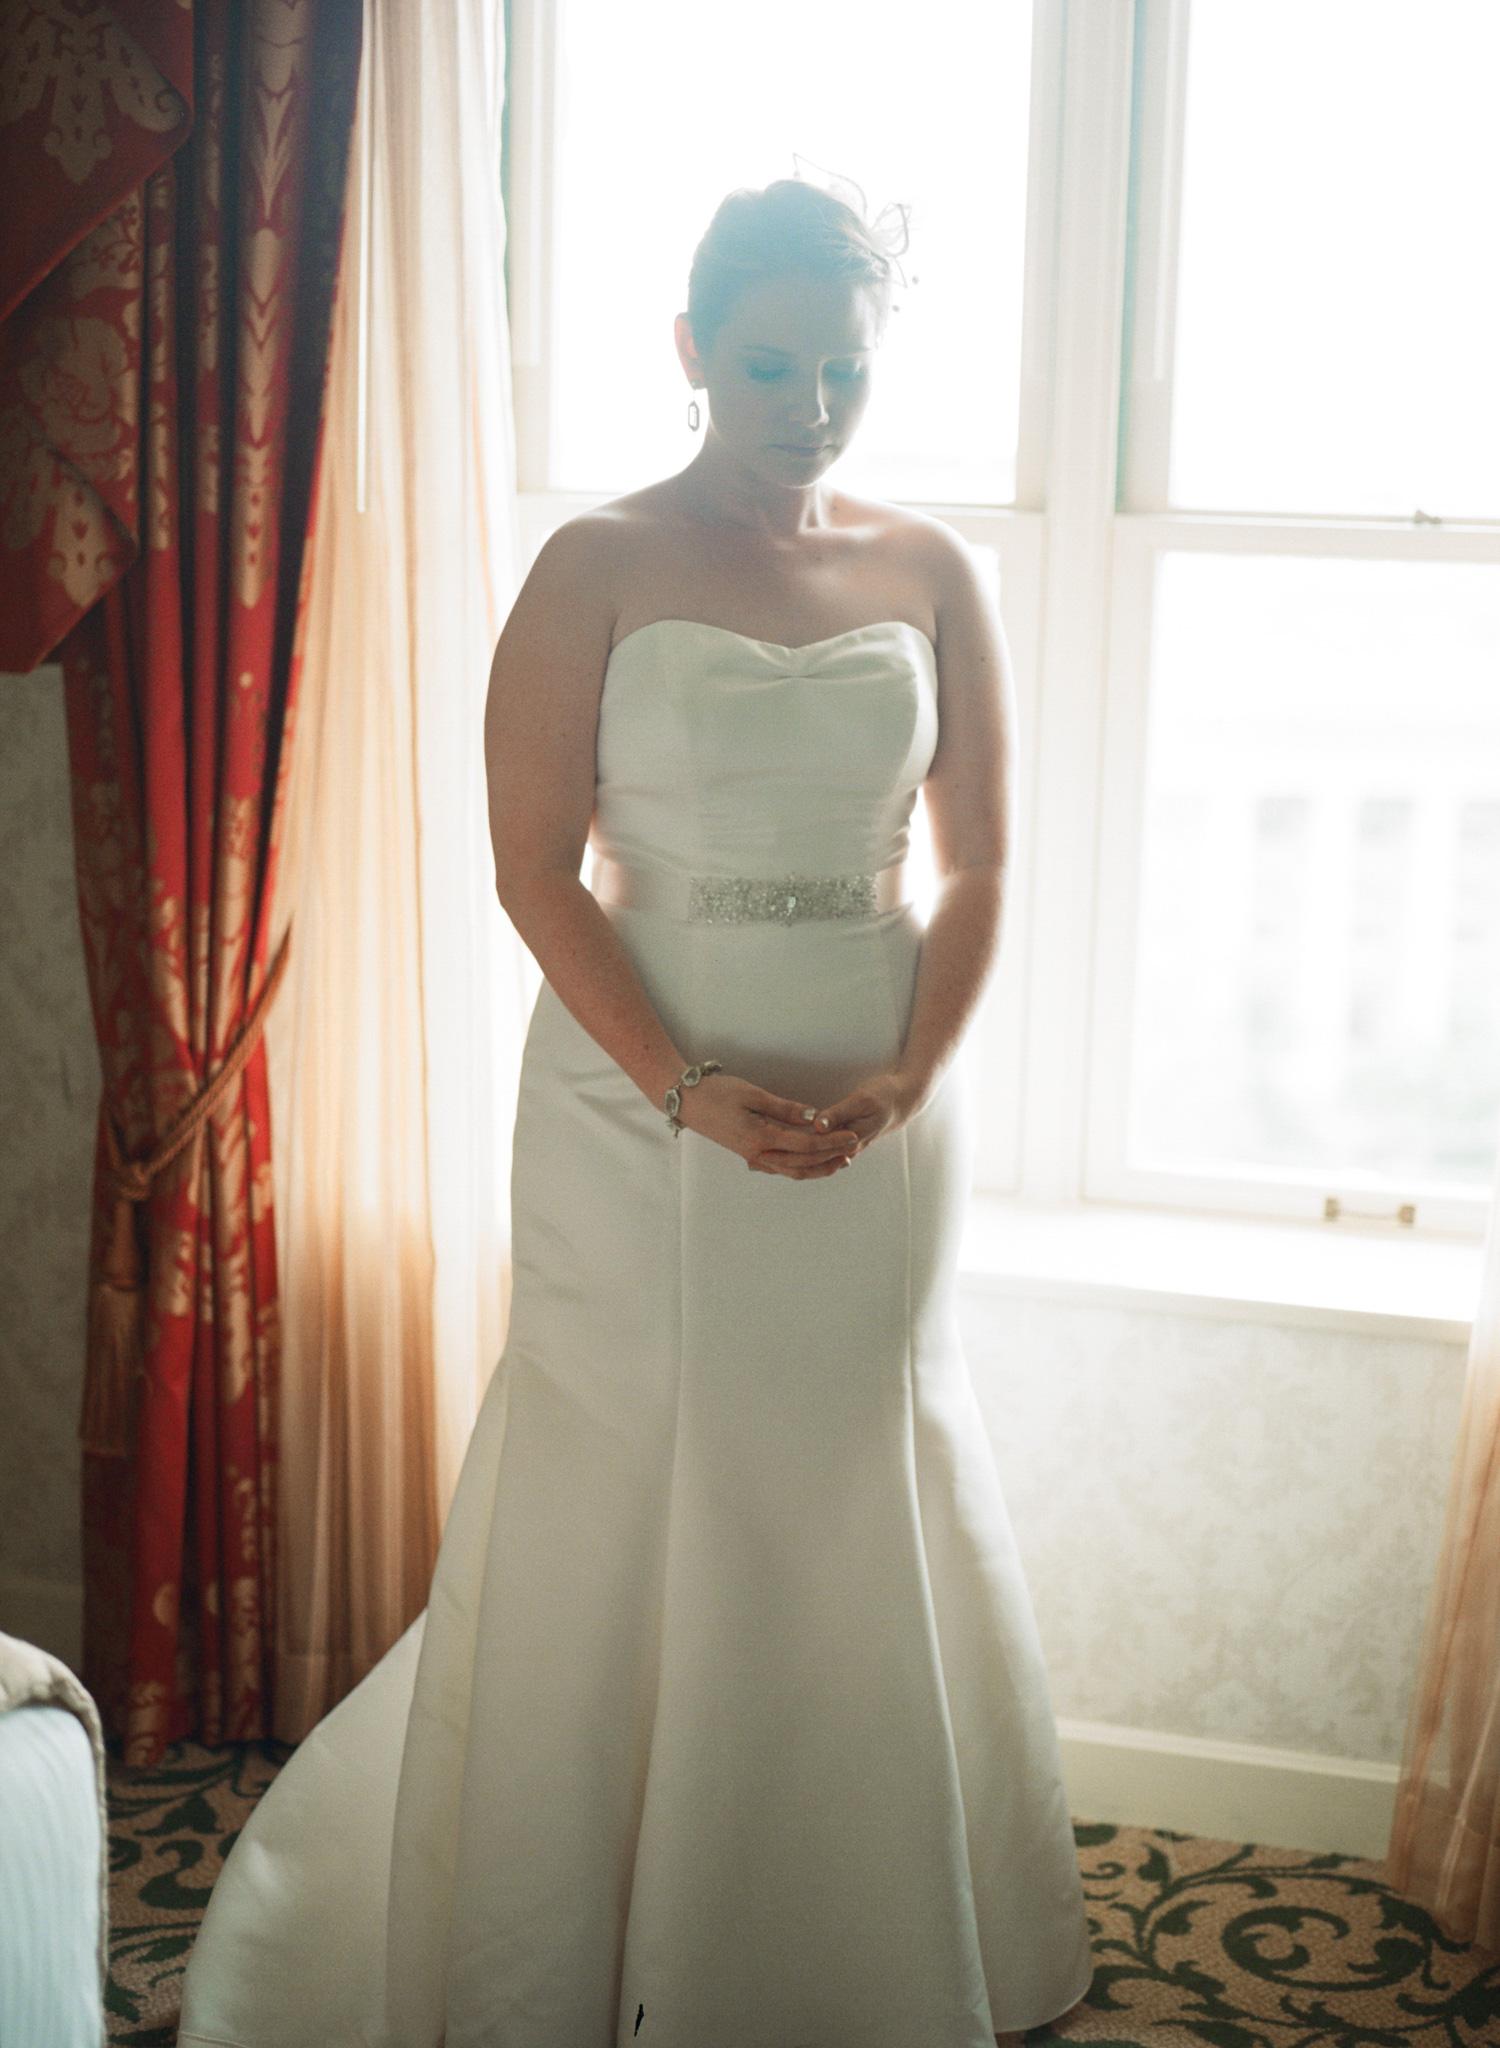 284-bride-getting-ready-at-williard-hotel.jpg